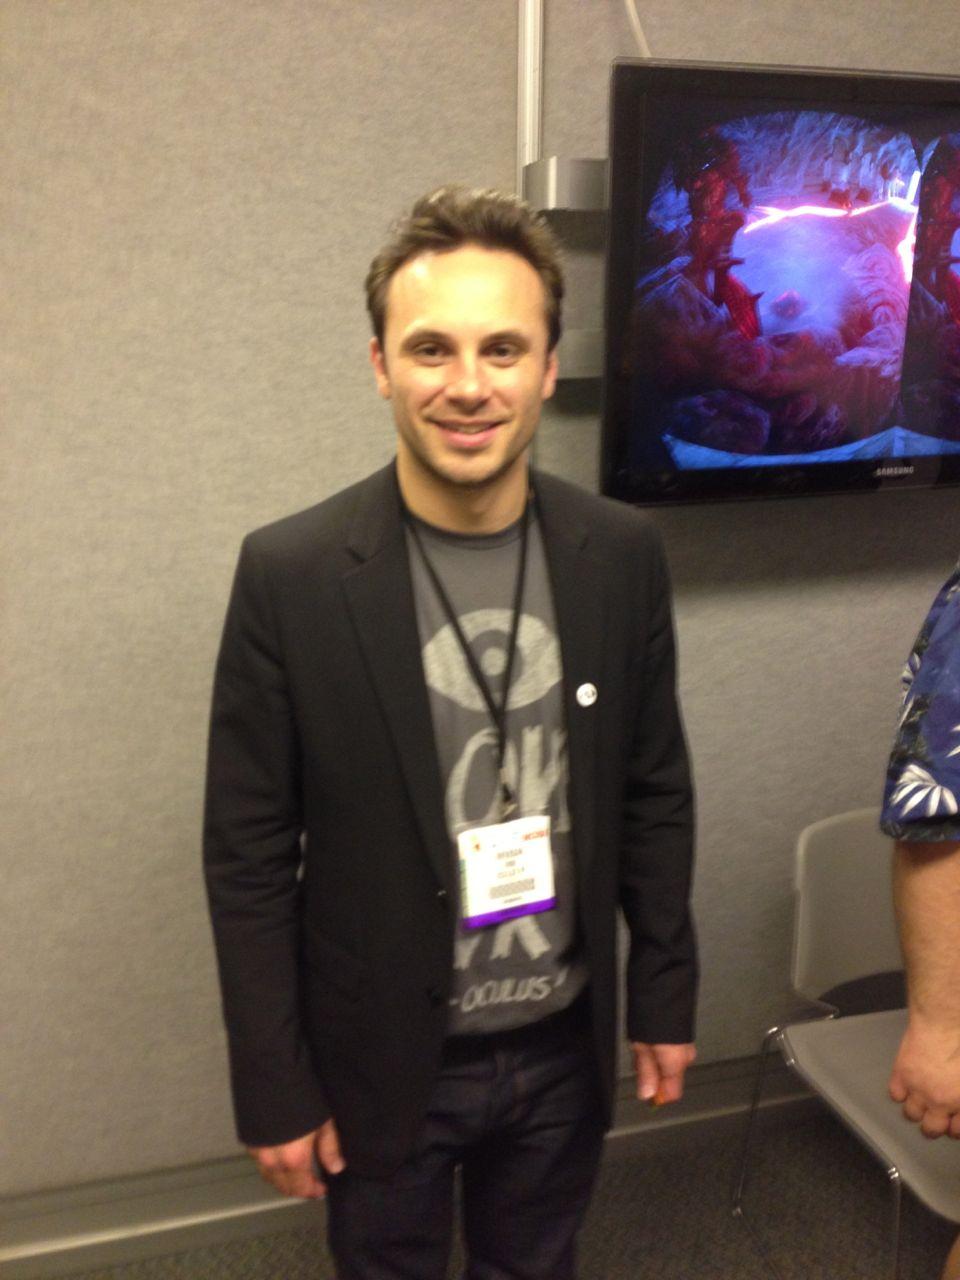 Oculus VR CEO Brendan Iribe